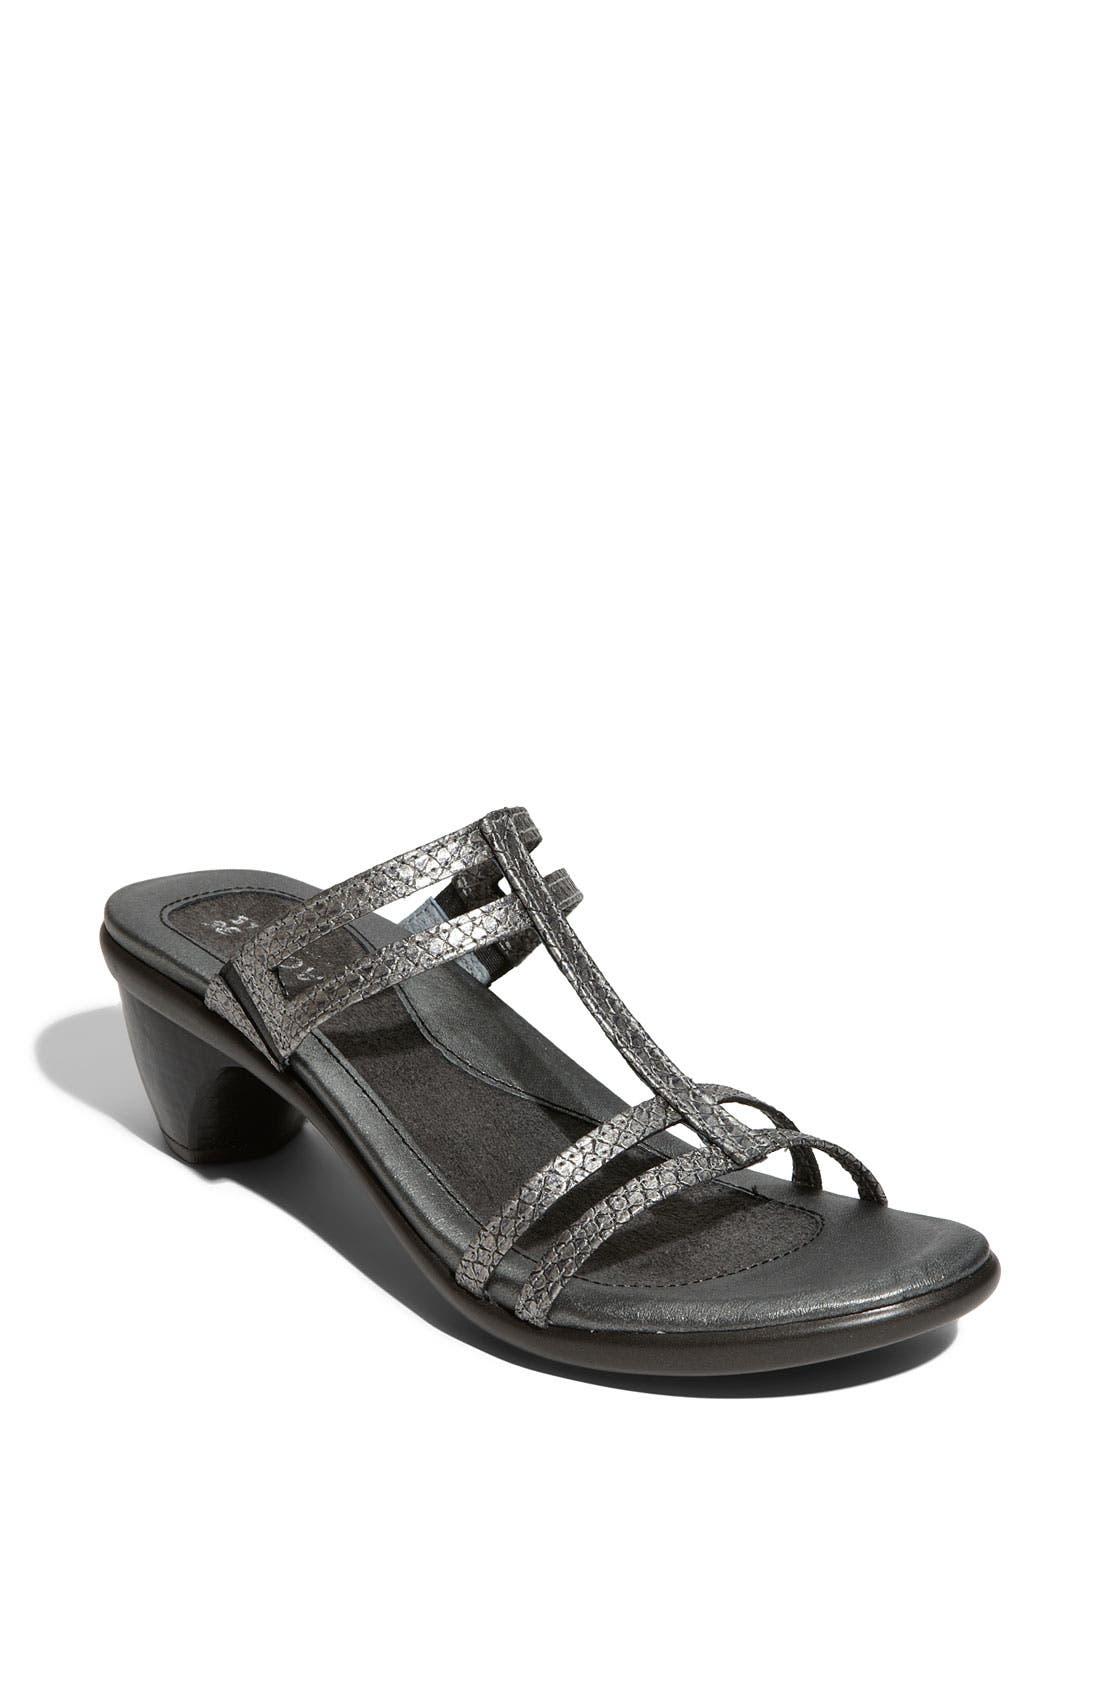 Main Image - Naot 'Loop' Sandal